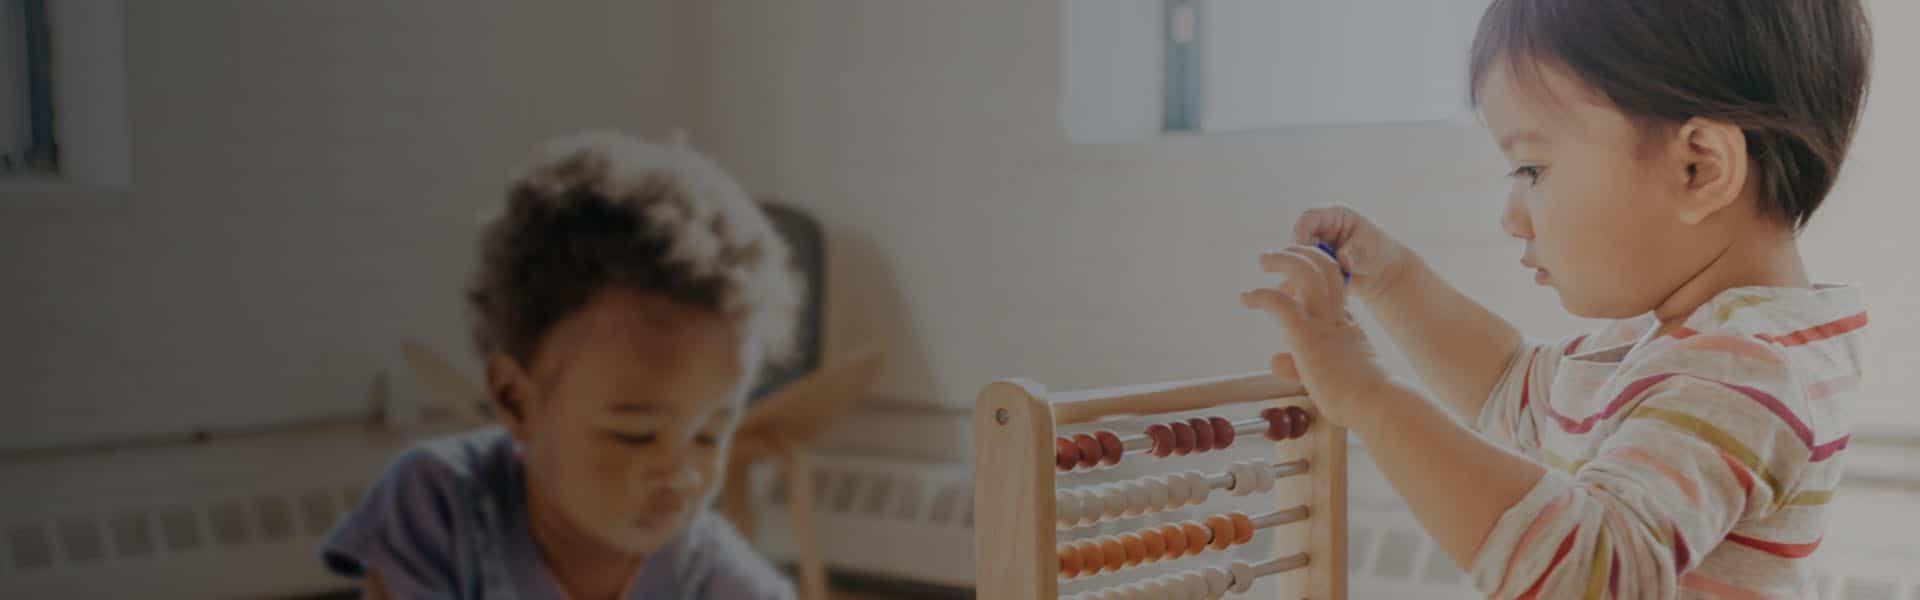 Childcare Liability Insurance